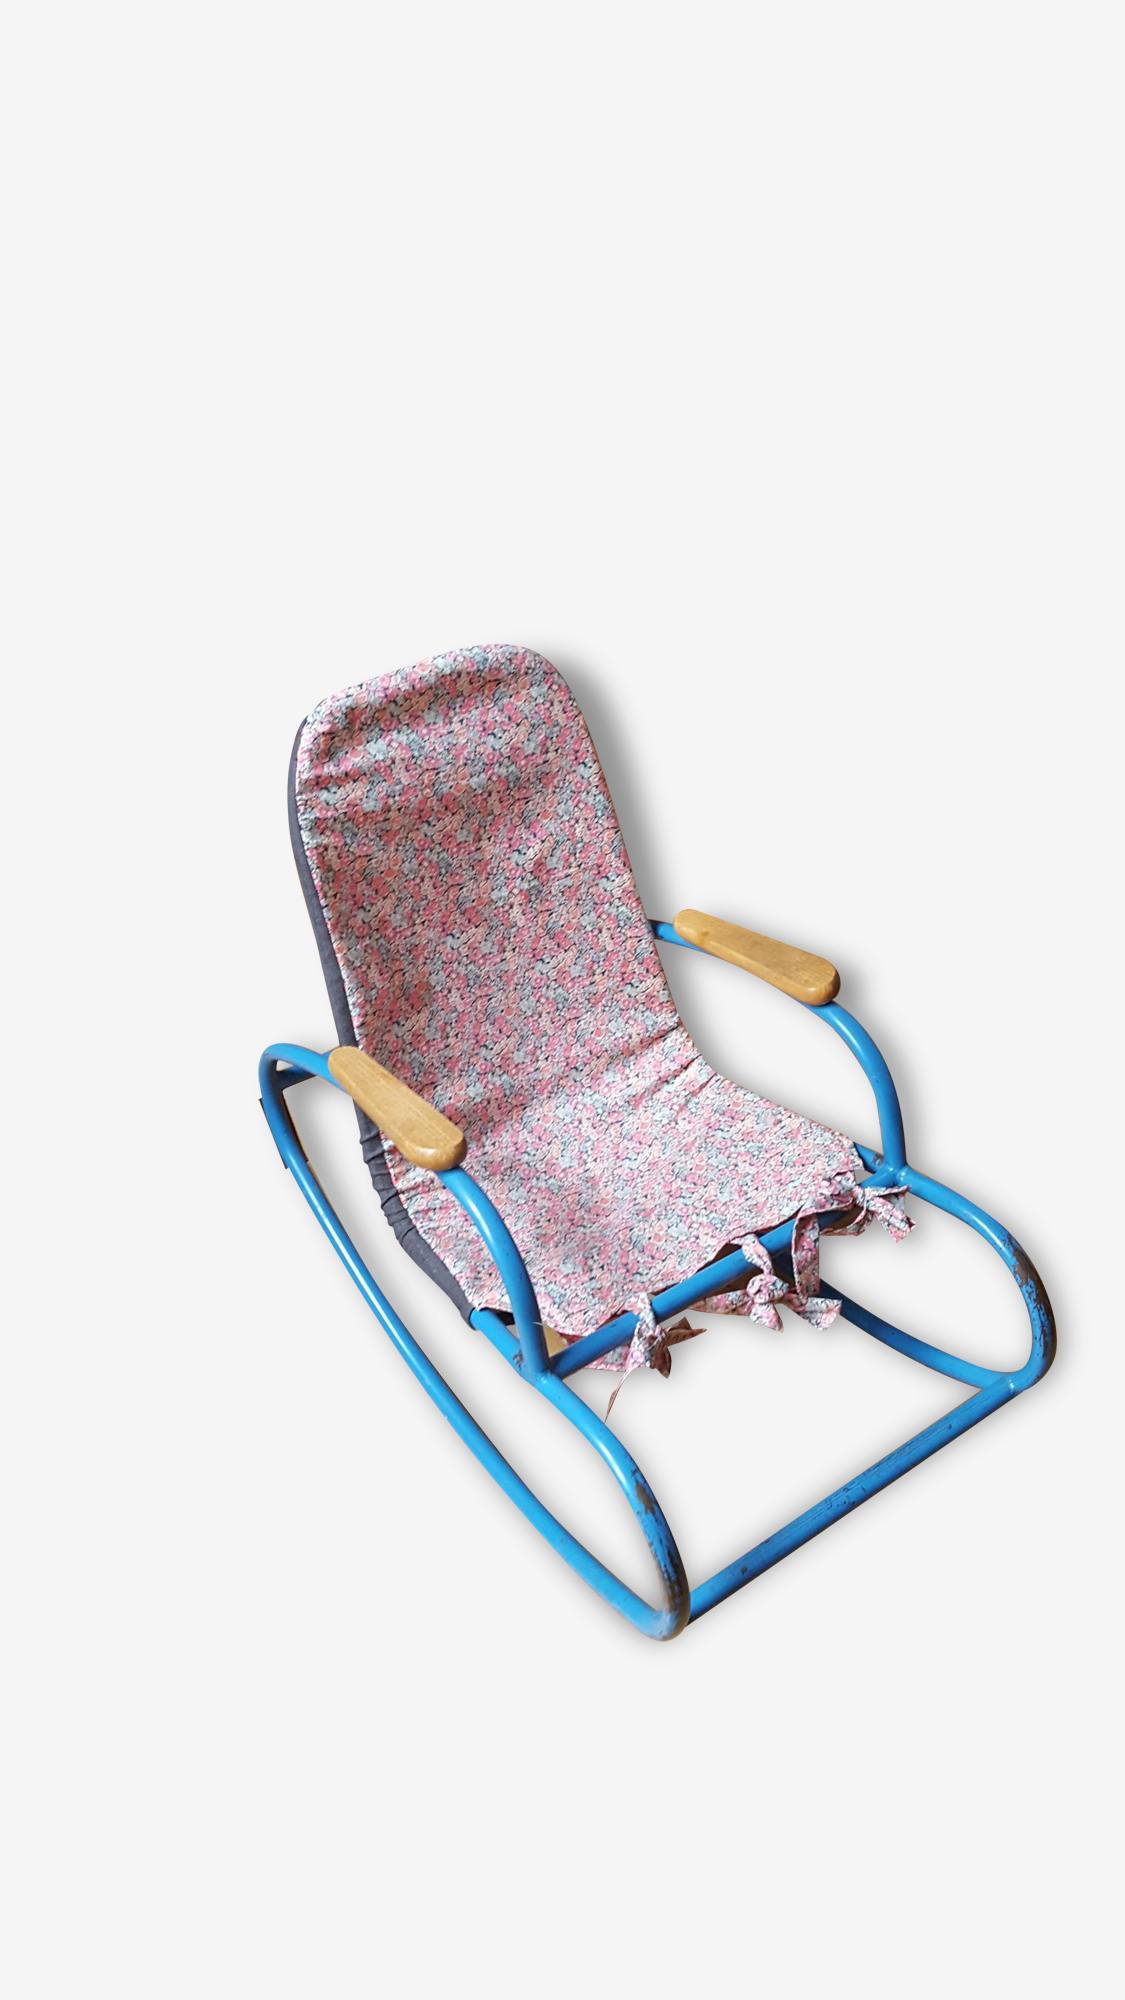 Rocking-chair liberty